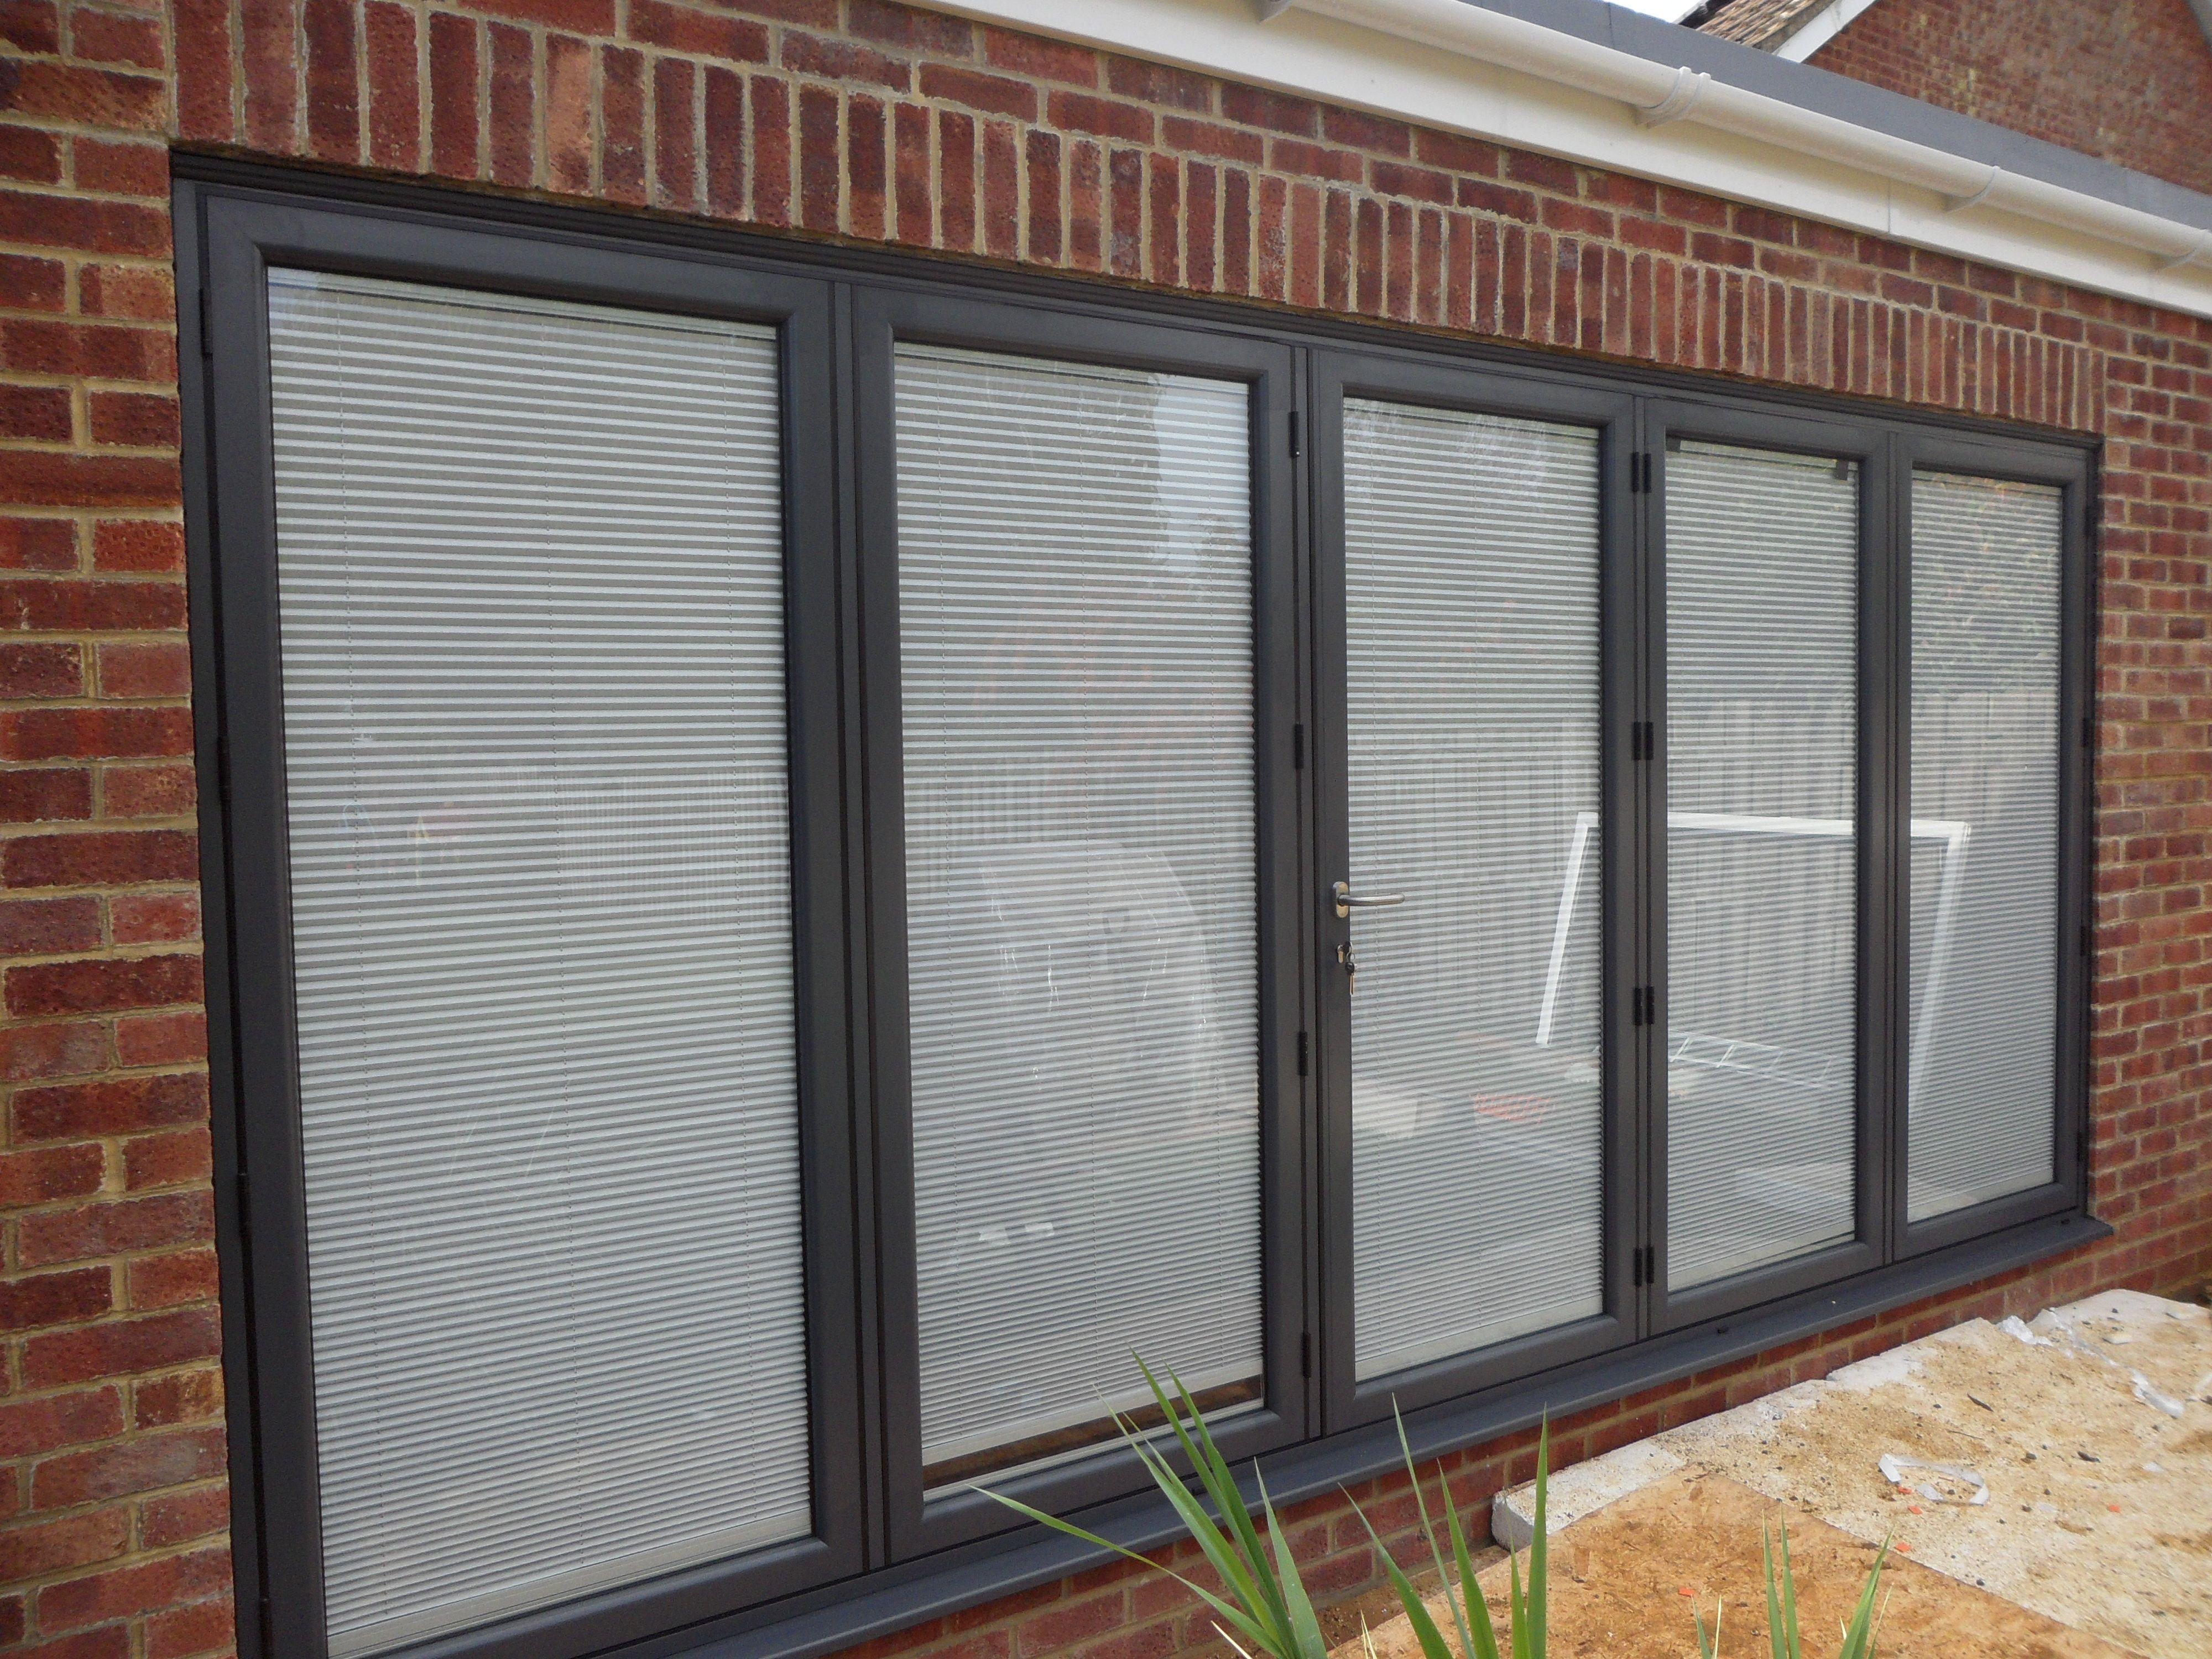 Gable end window ideas  pin by gilham u gilham glass u maidstone trade windows on maidstone